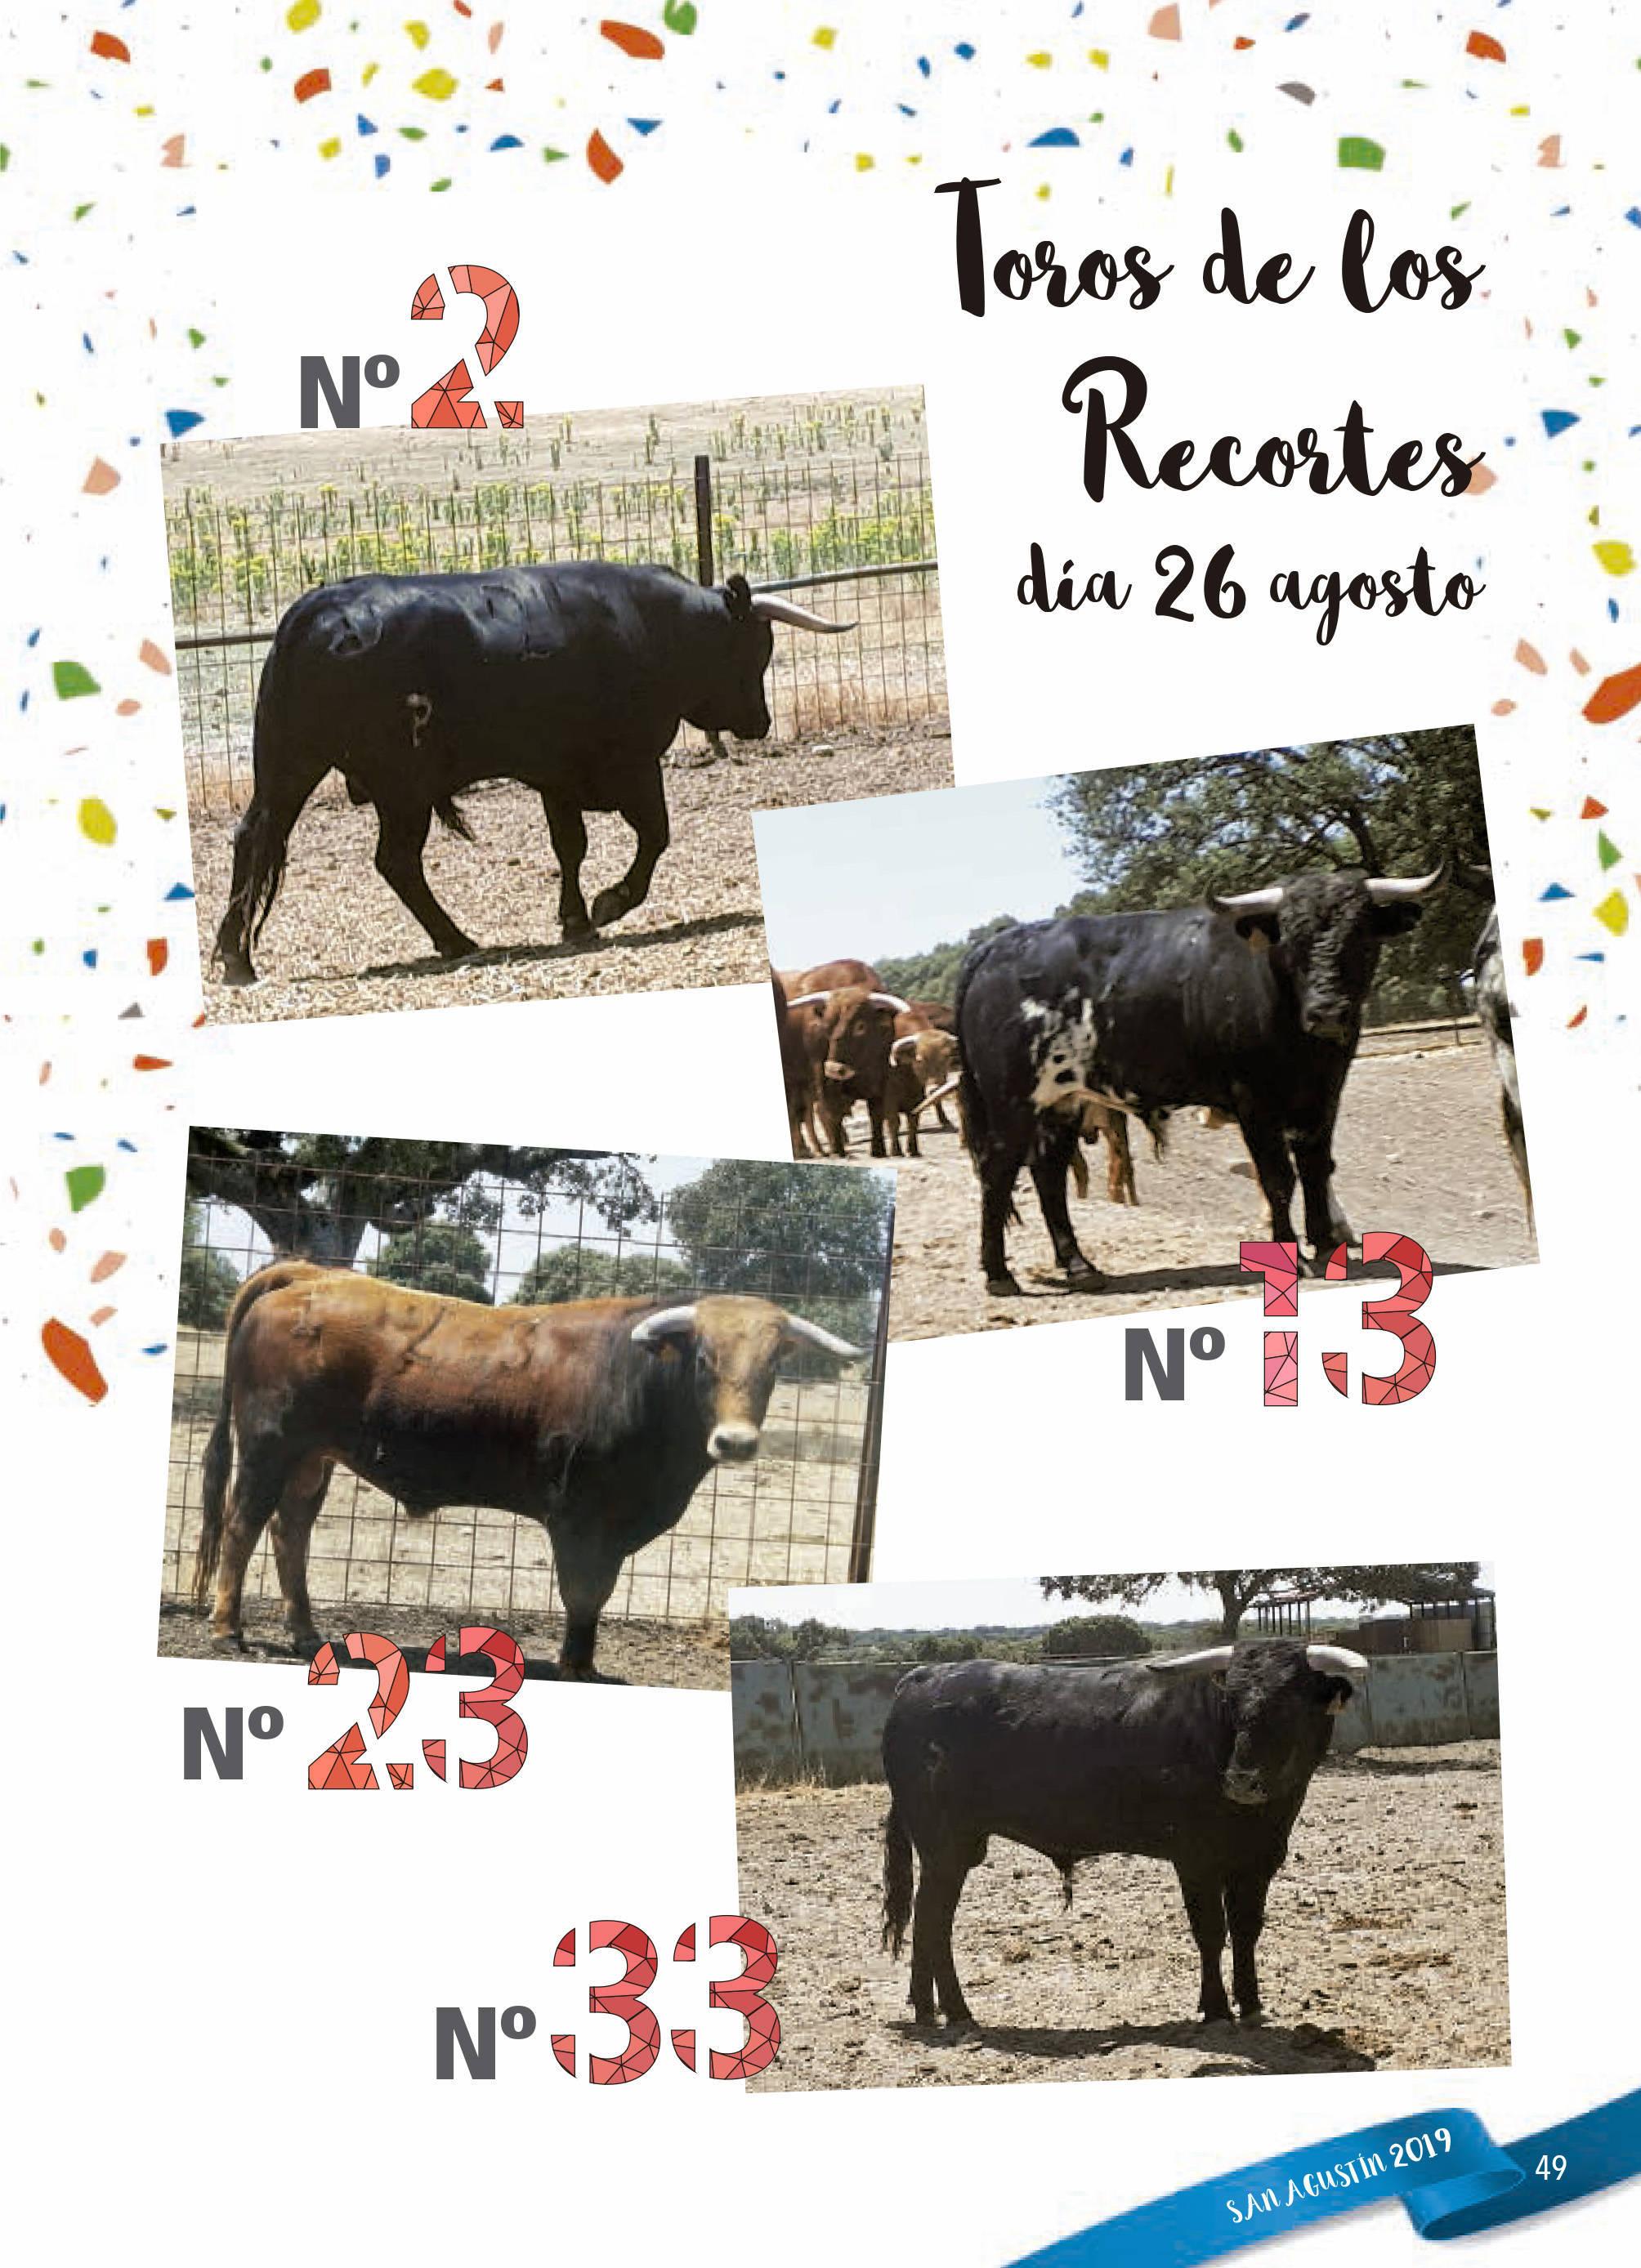 Programa de ferias y fiestas 2019 - Fermoselle (Zamora) 19